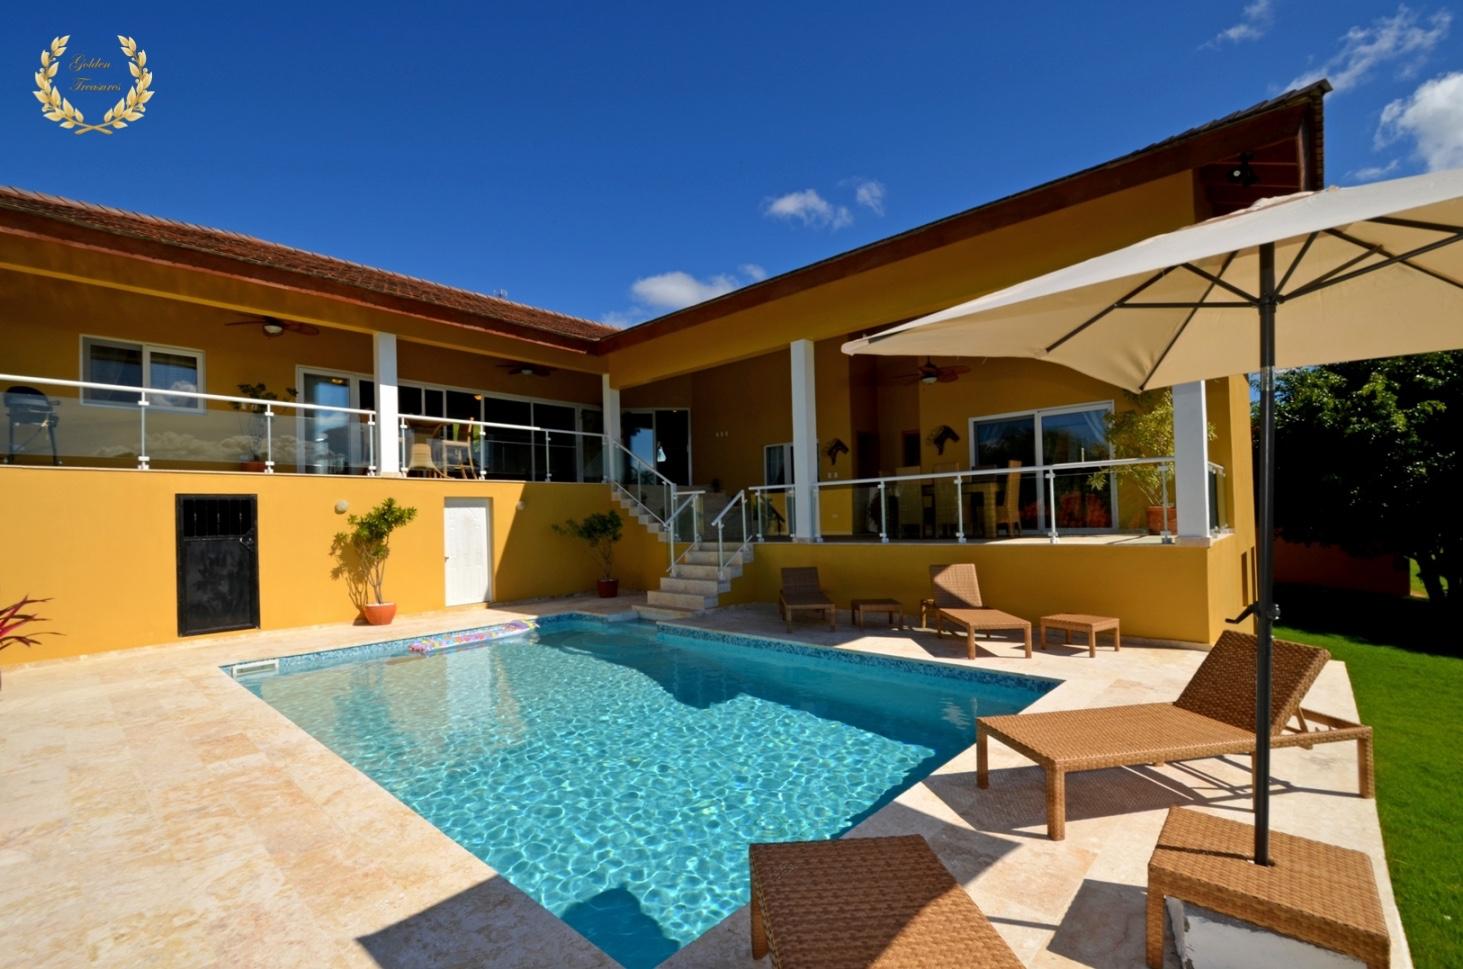 3 Bedroom Villa Rental With Panoramic Vistas